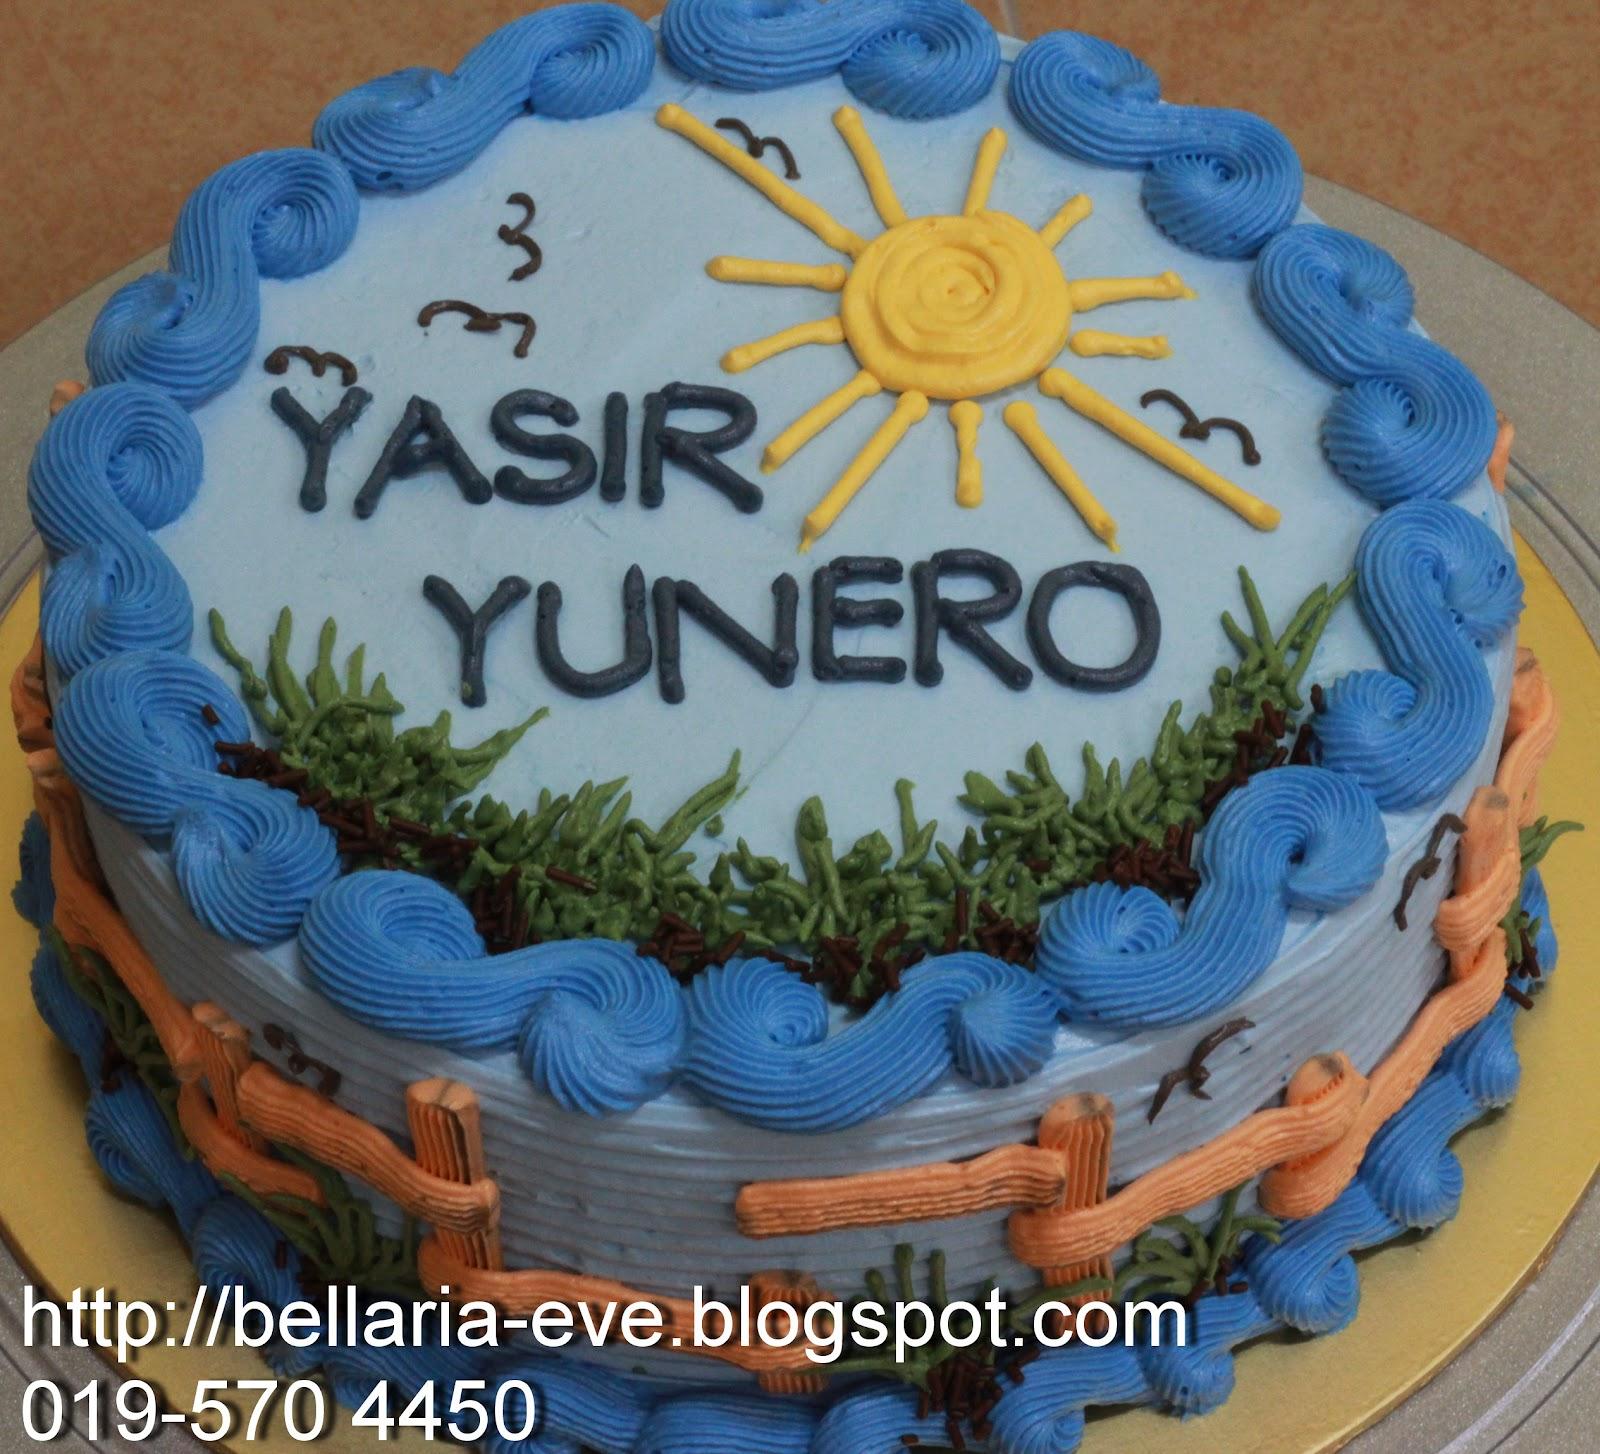 Bellaria Happy Birthday Yasir Yunero San